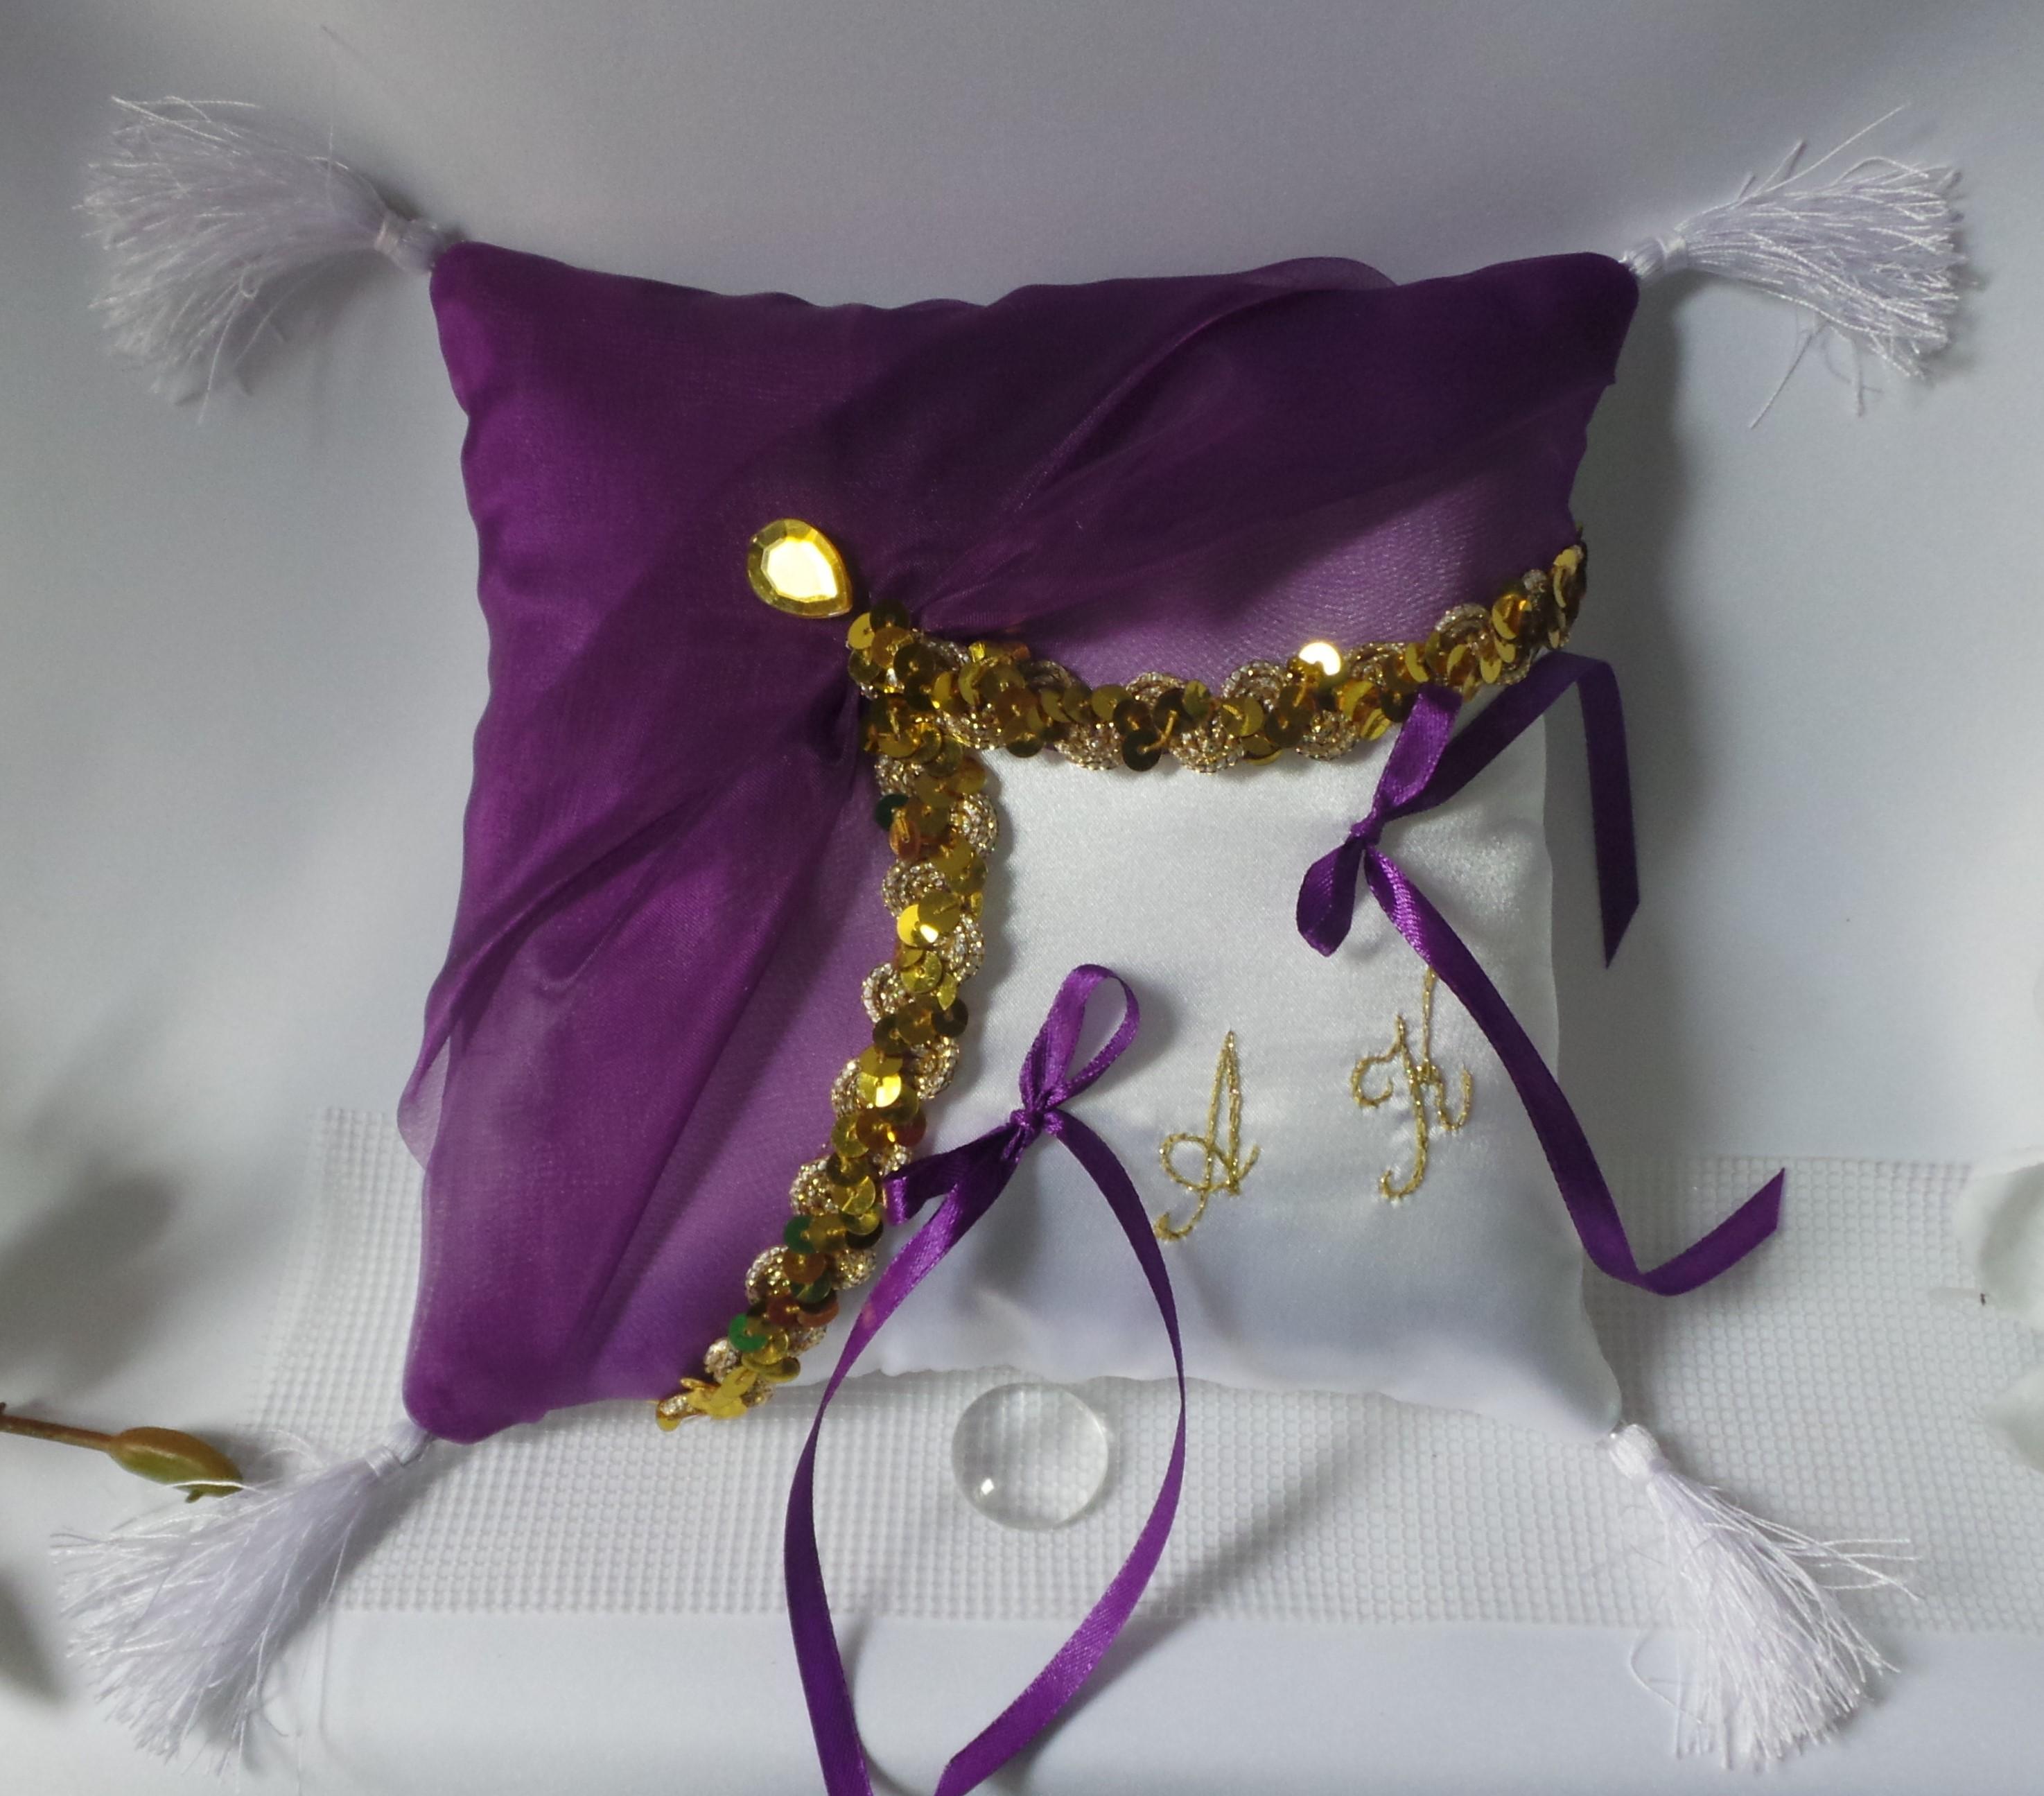 Coussin alliance personnalise oriental violet blance et or